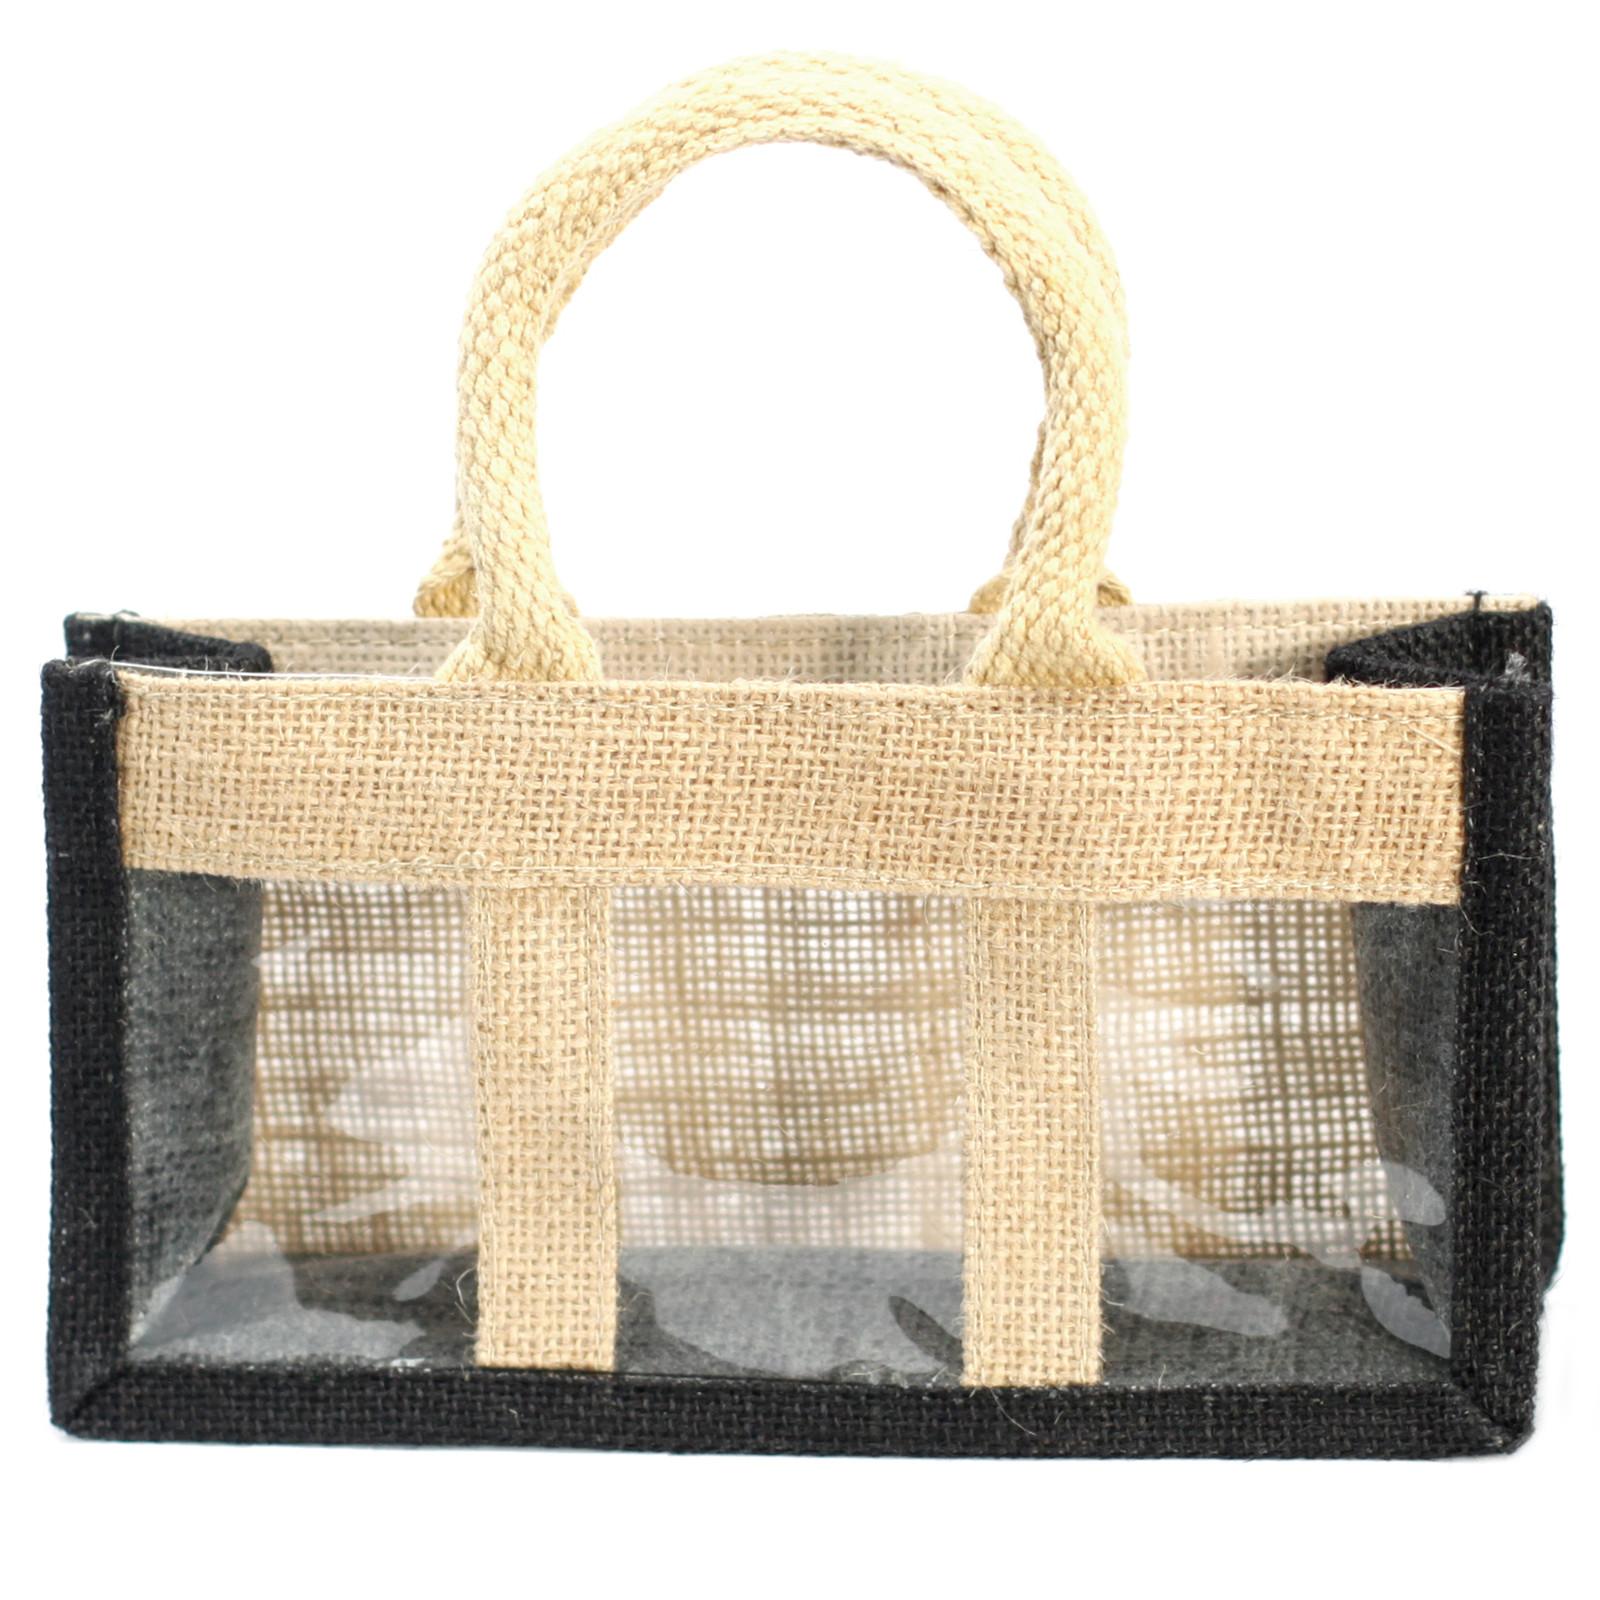 Three Jar Jute Gift Bag Black Soft Handle